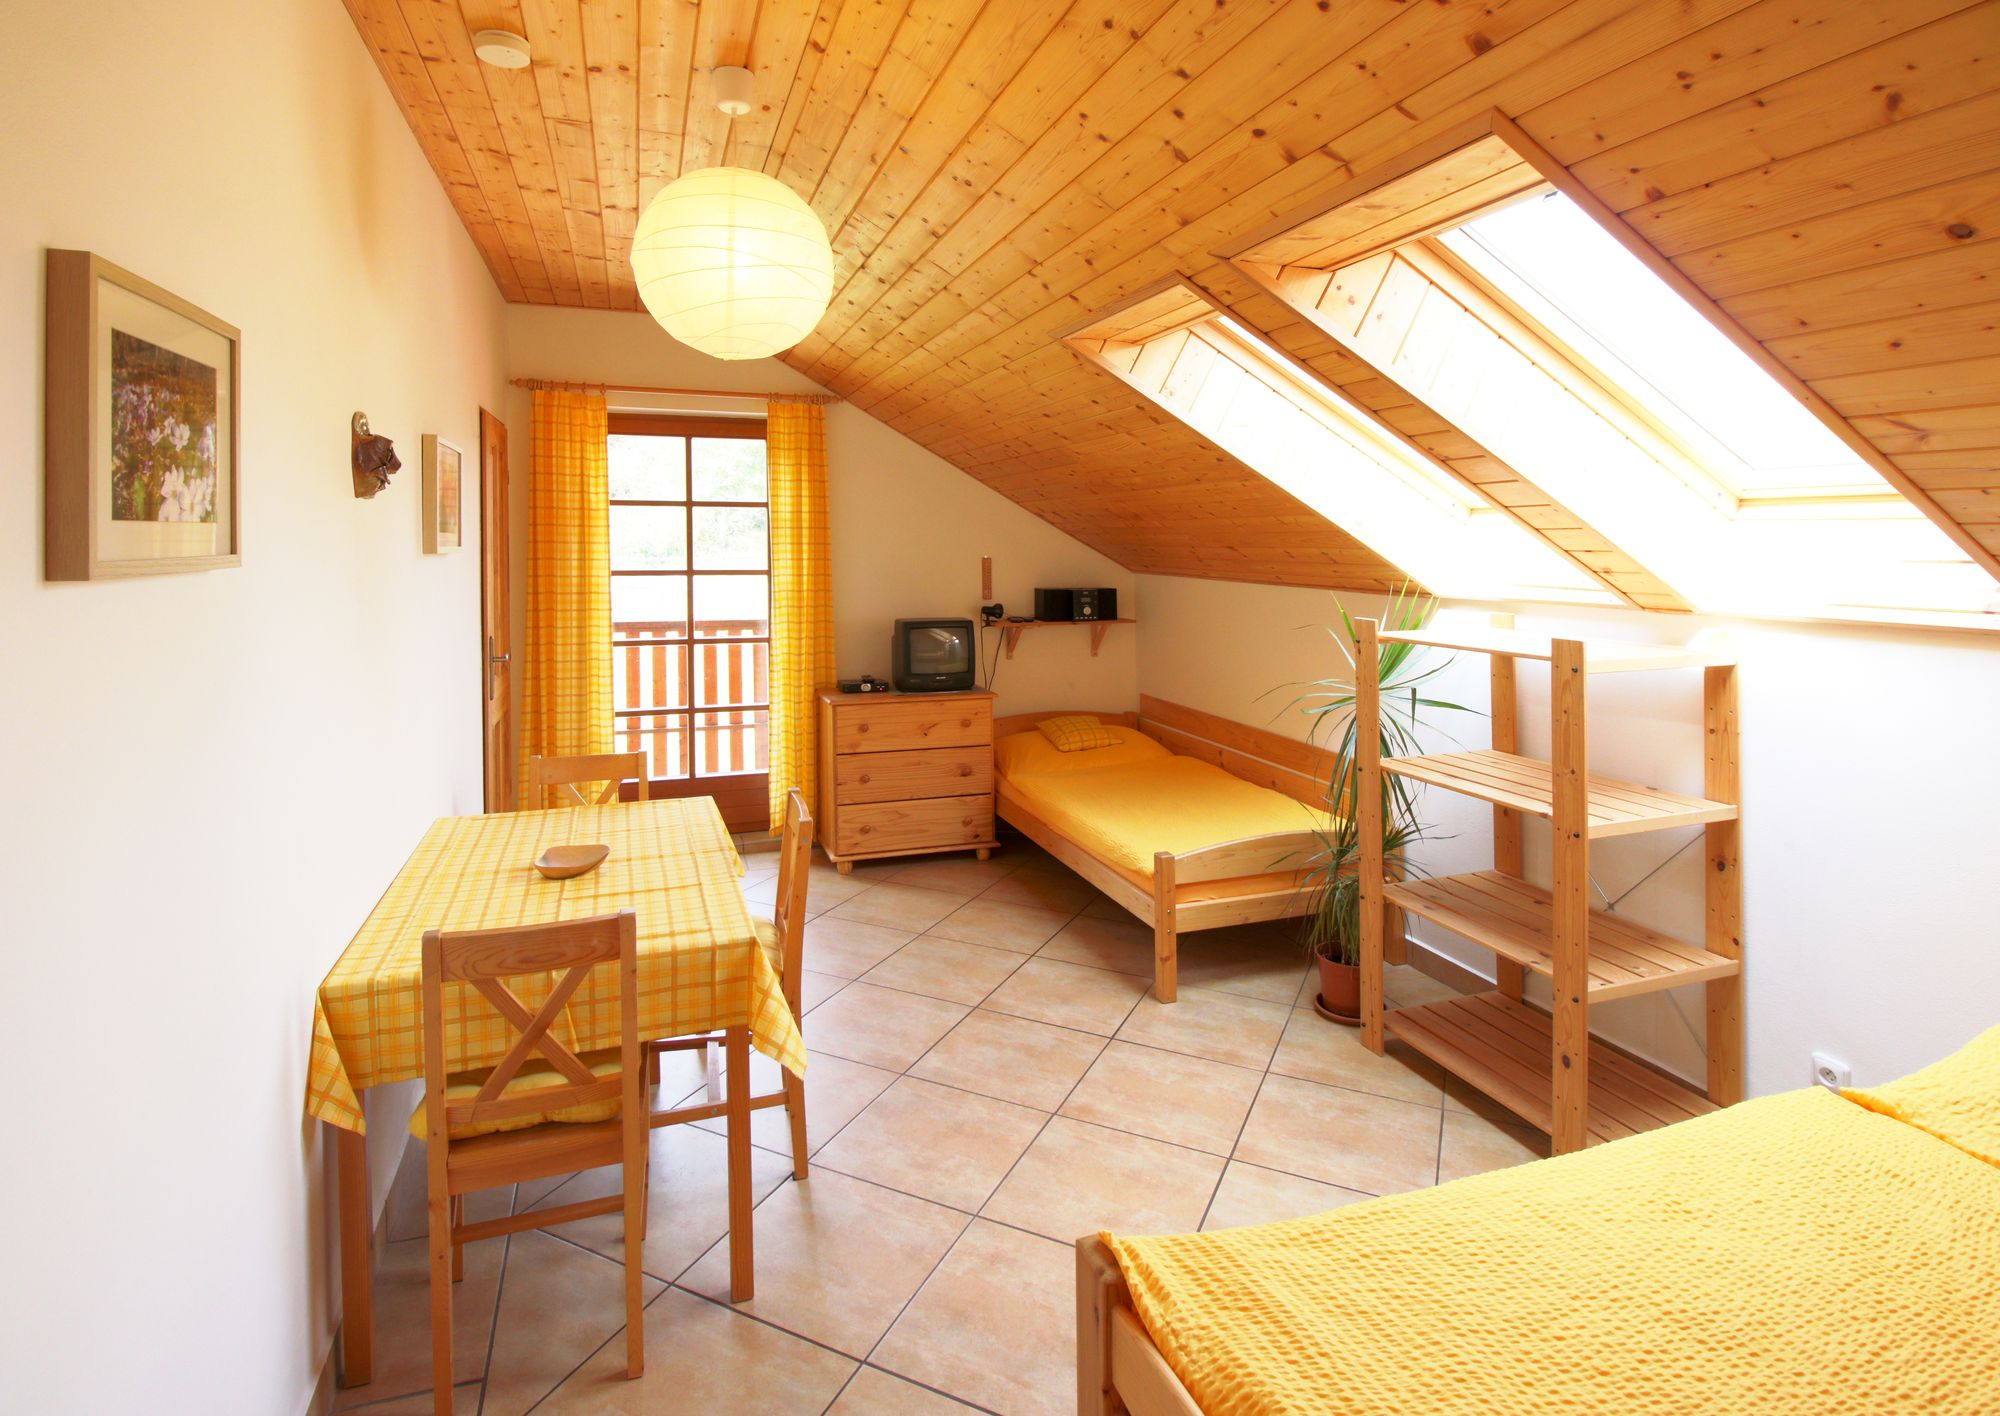 Ložnice apartmánuč. 3 - podkroví